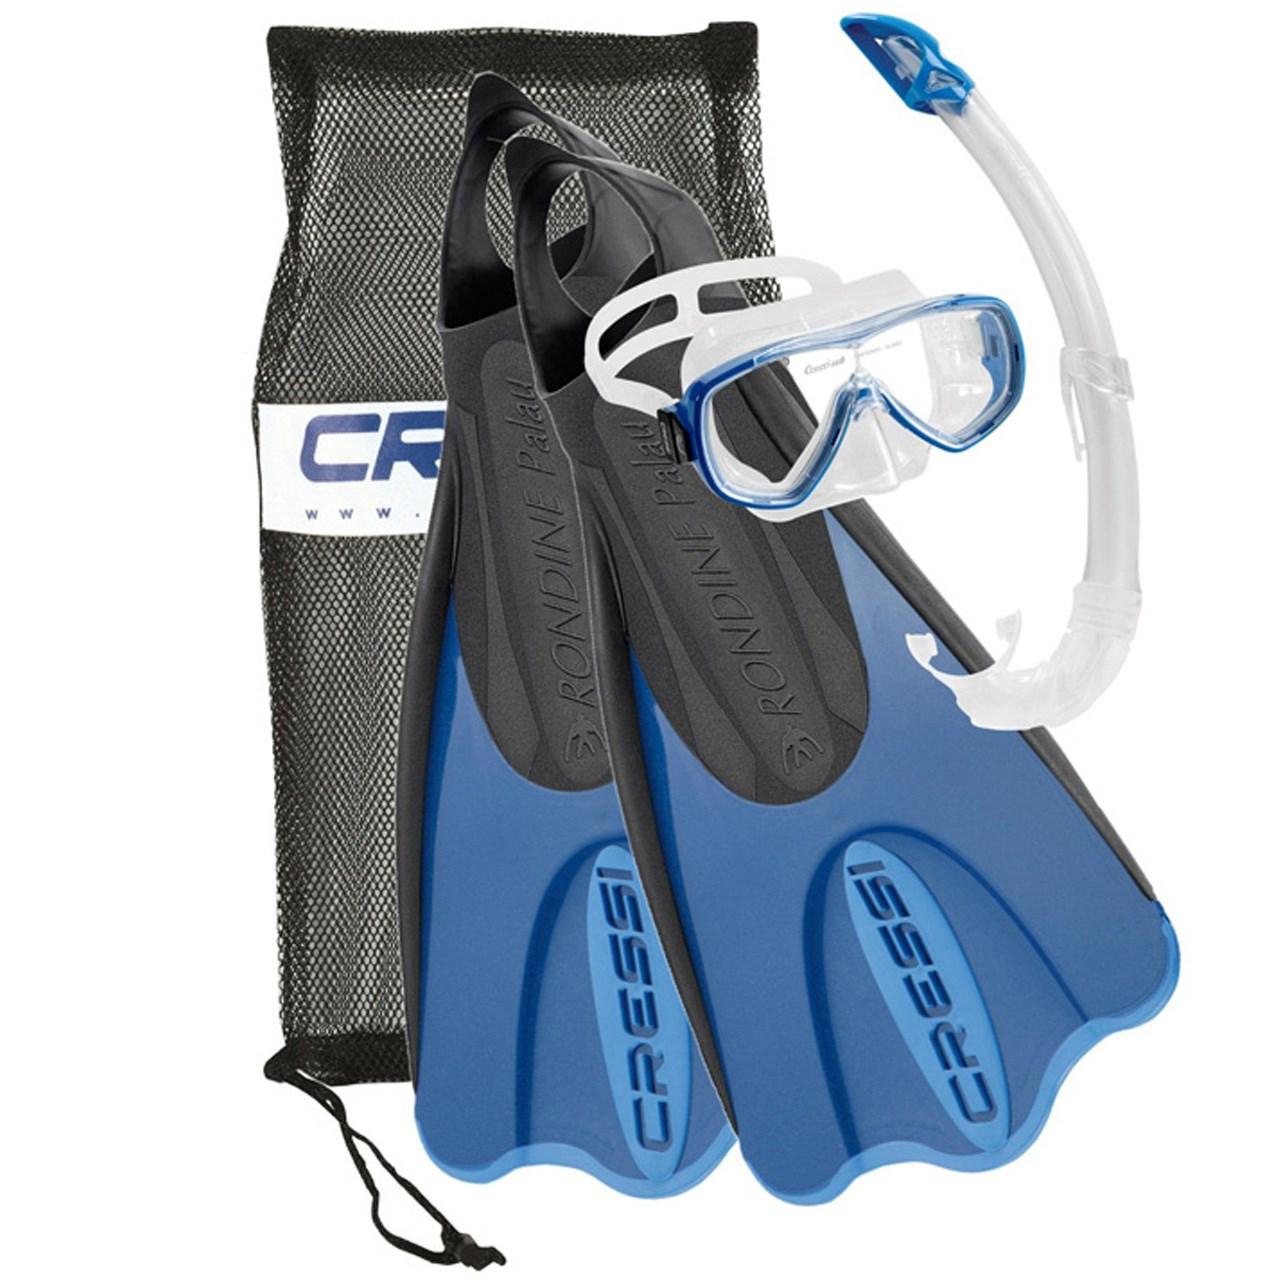 مجموعه اسنورکلینگ کرسی مدل  Elastic Short Bag Blue سایز 38-41